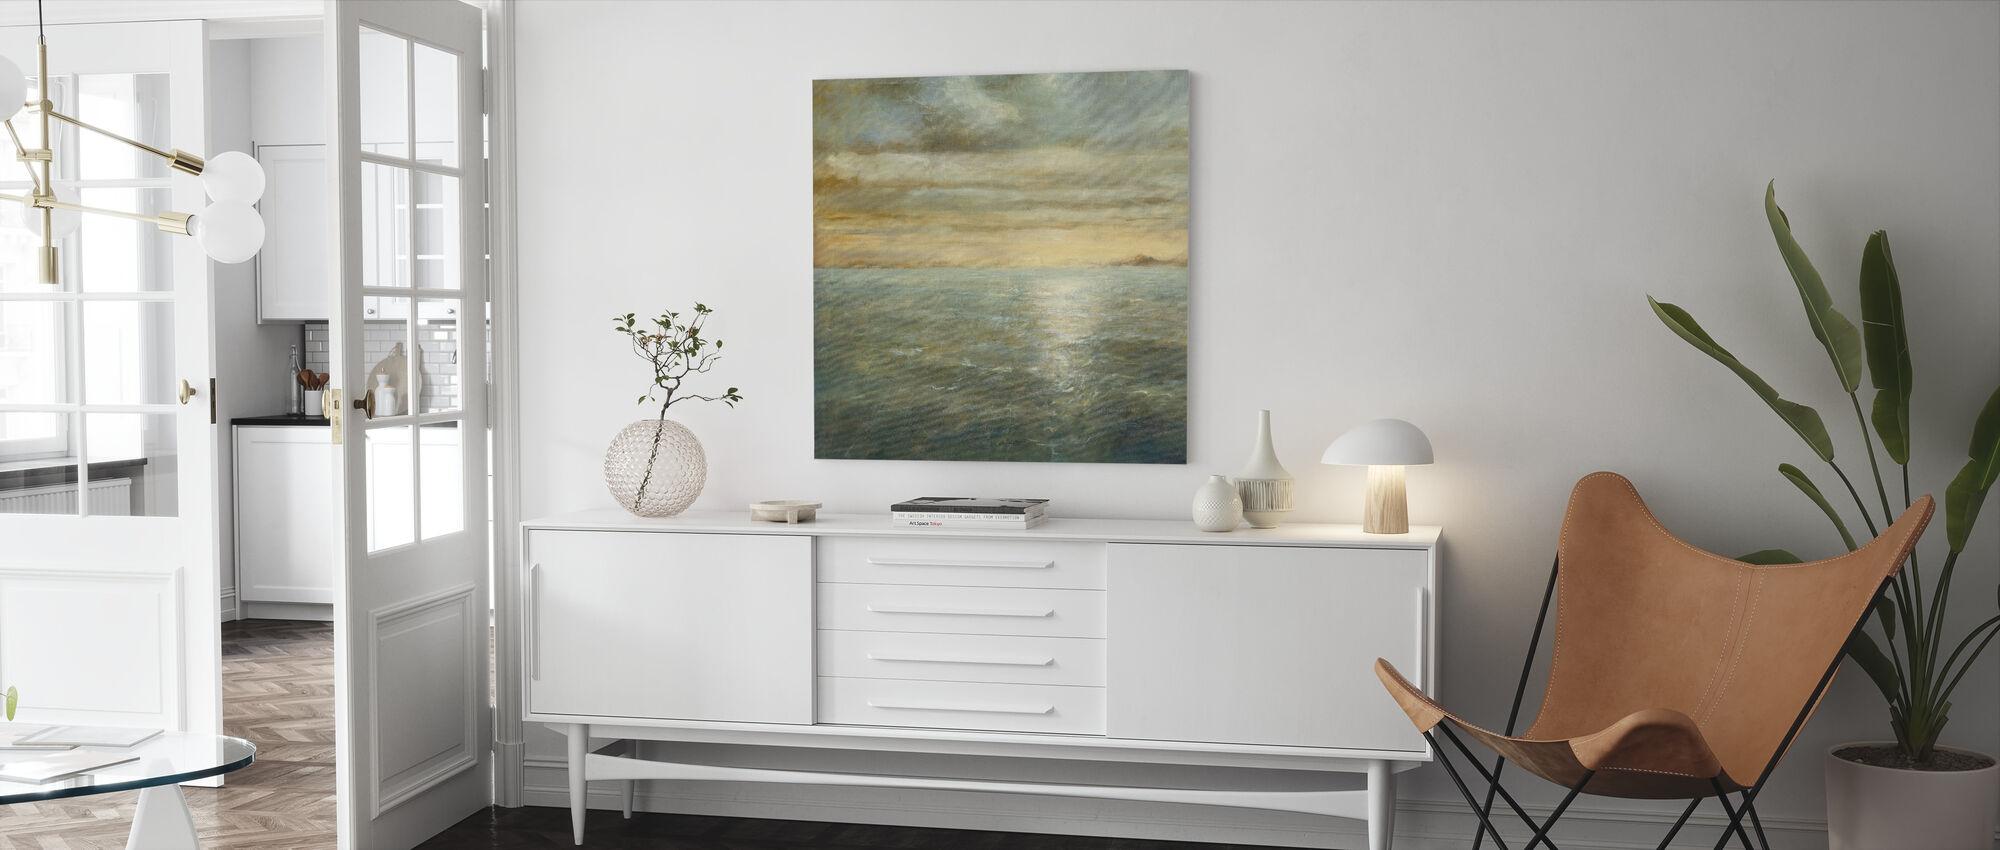 Serene Havet - Canvastavla - Vardagsrum